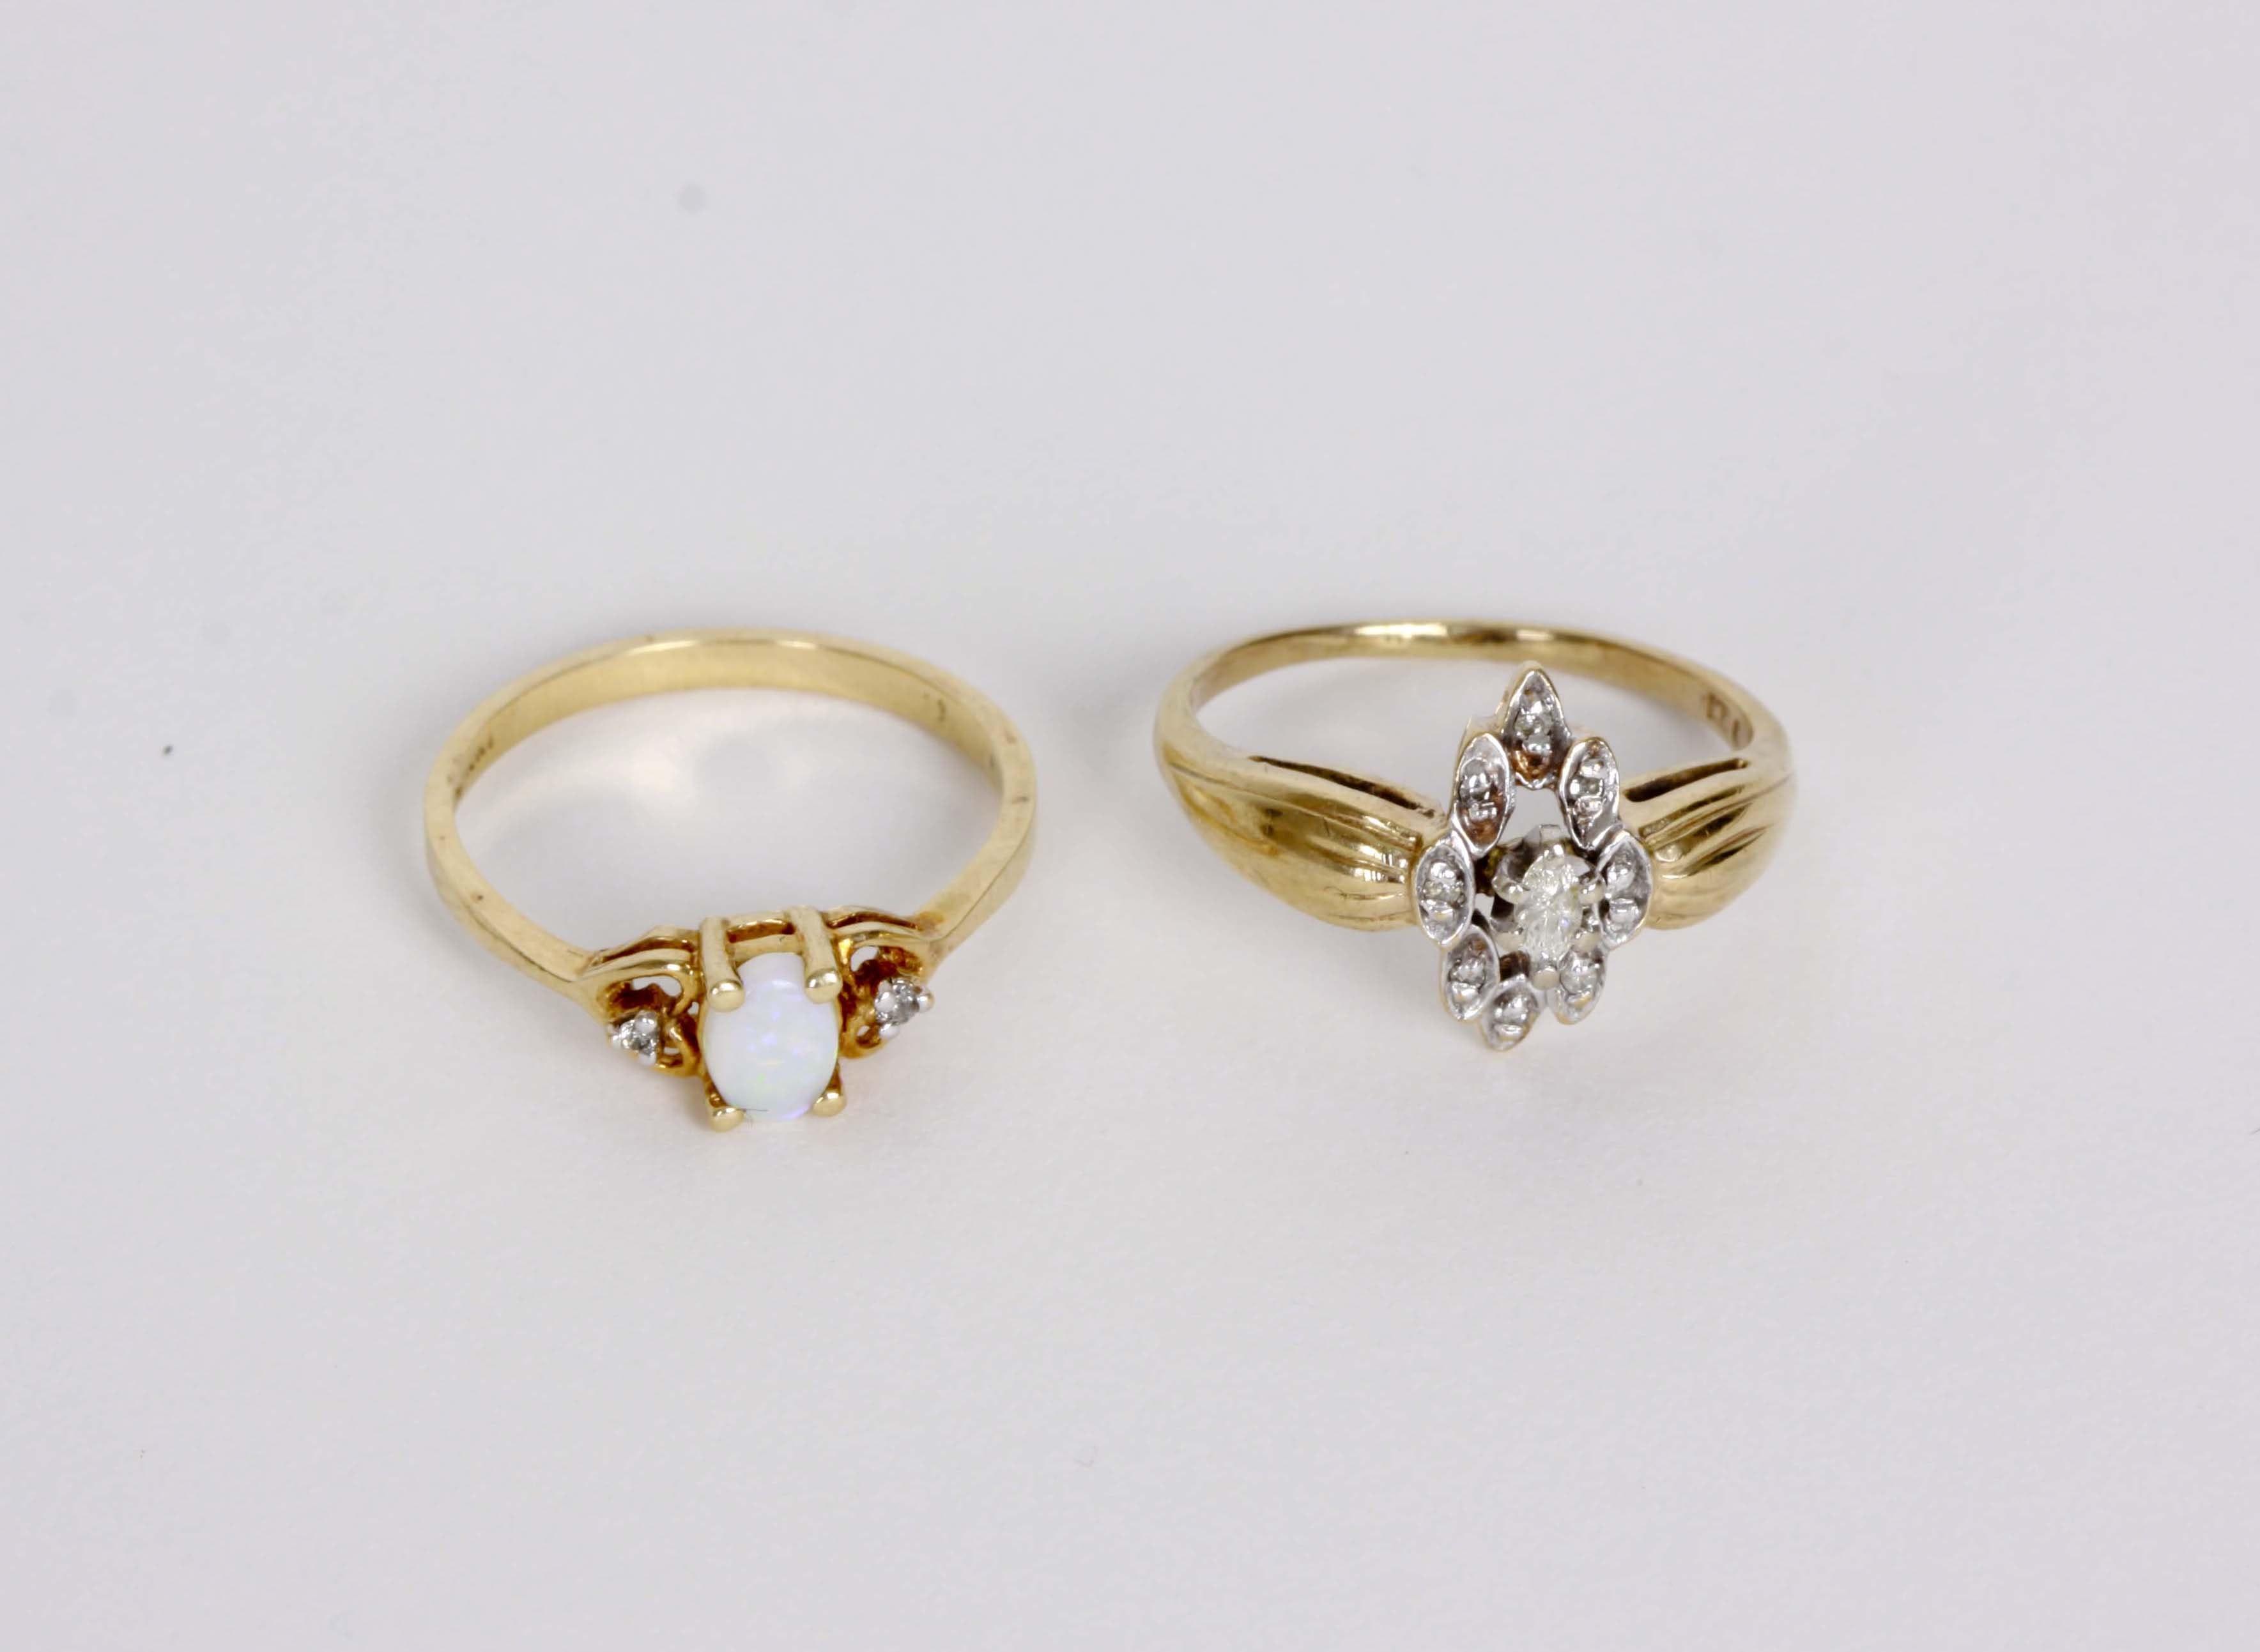 10K Gold Diamond Ring and 10K Gold Diamond Opal Ring